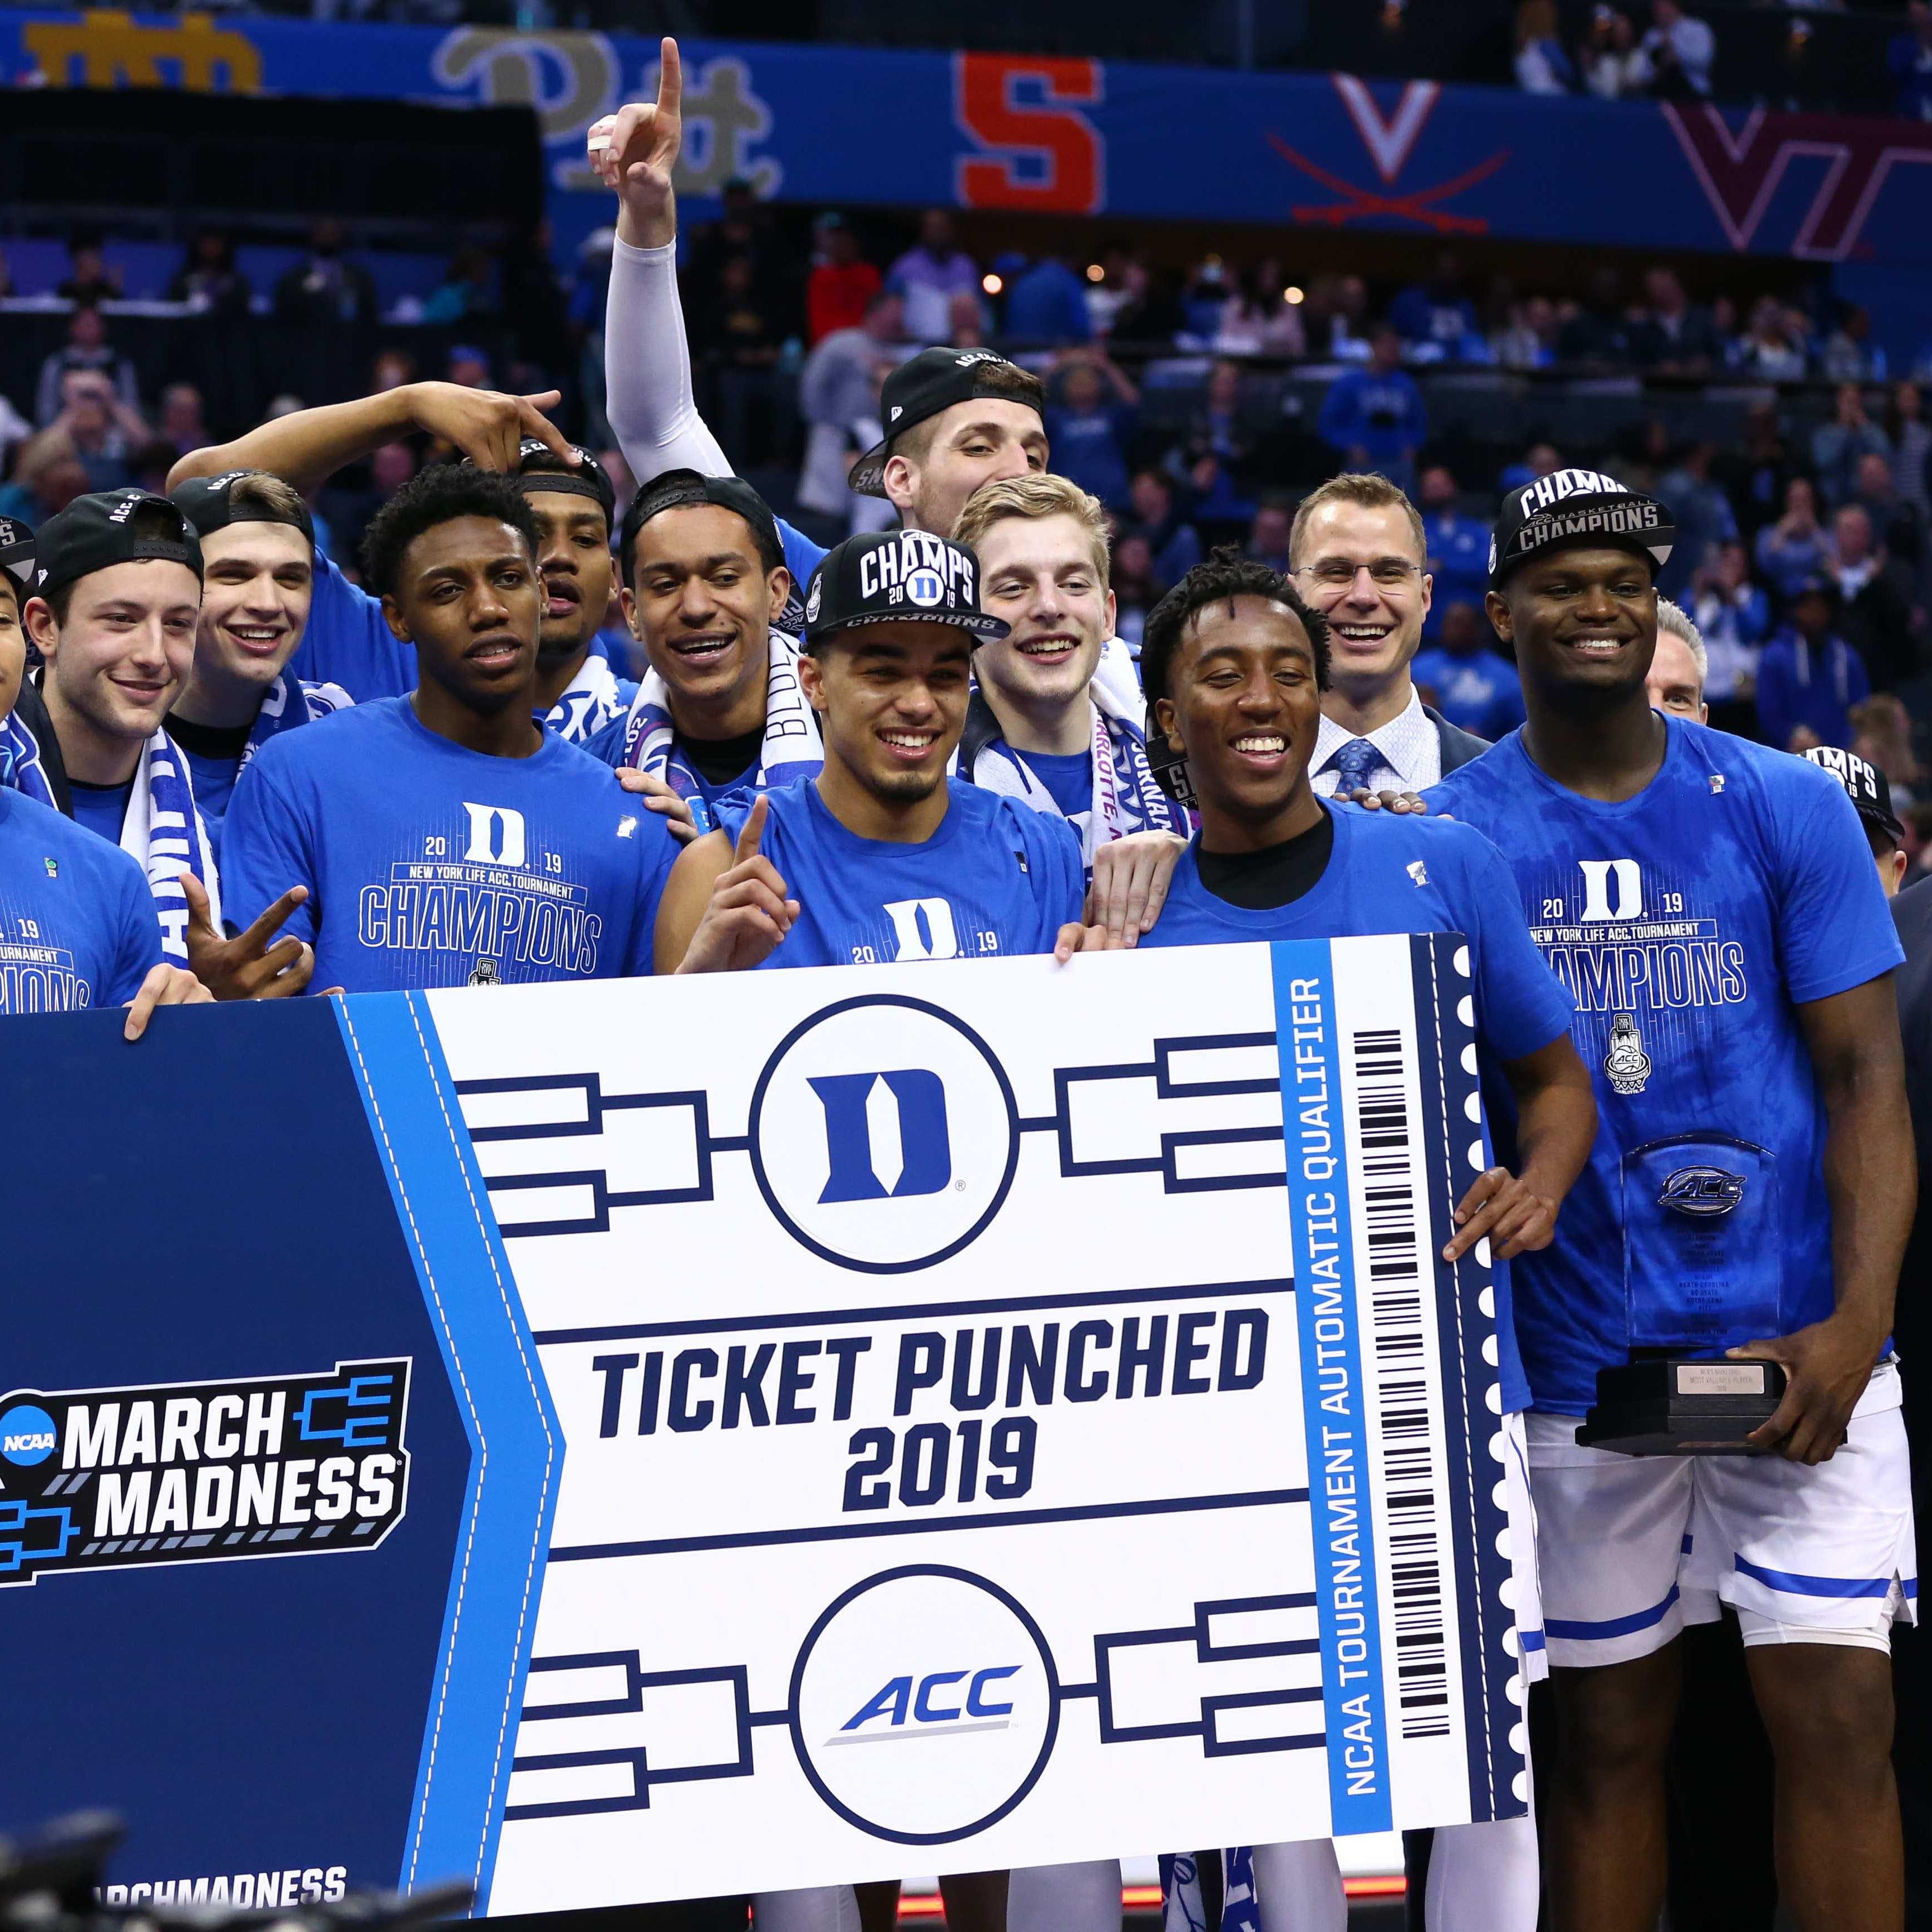 Download the 2019 NCAA basketball tournament bracket